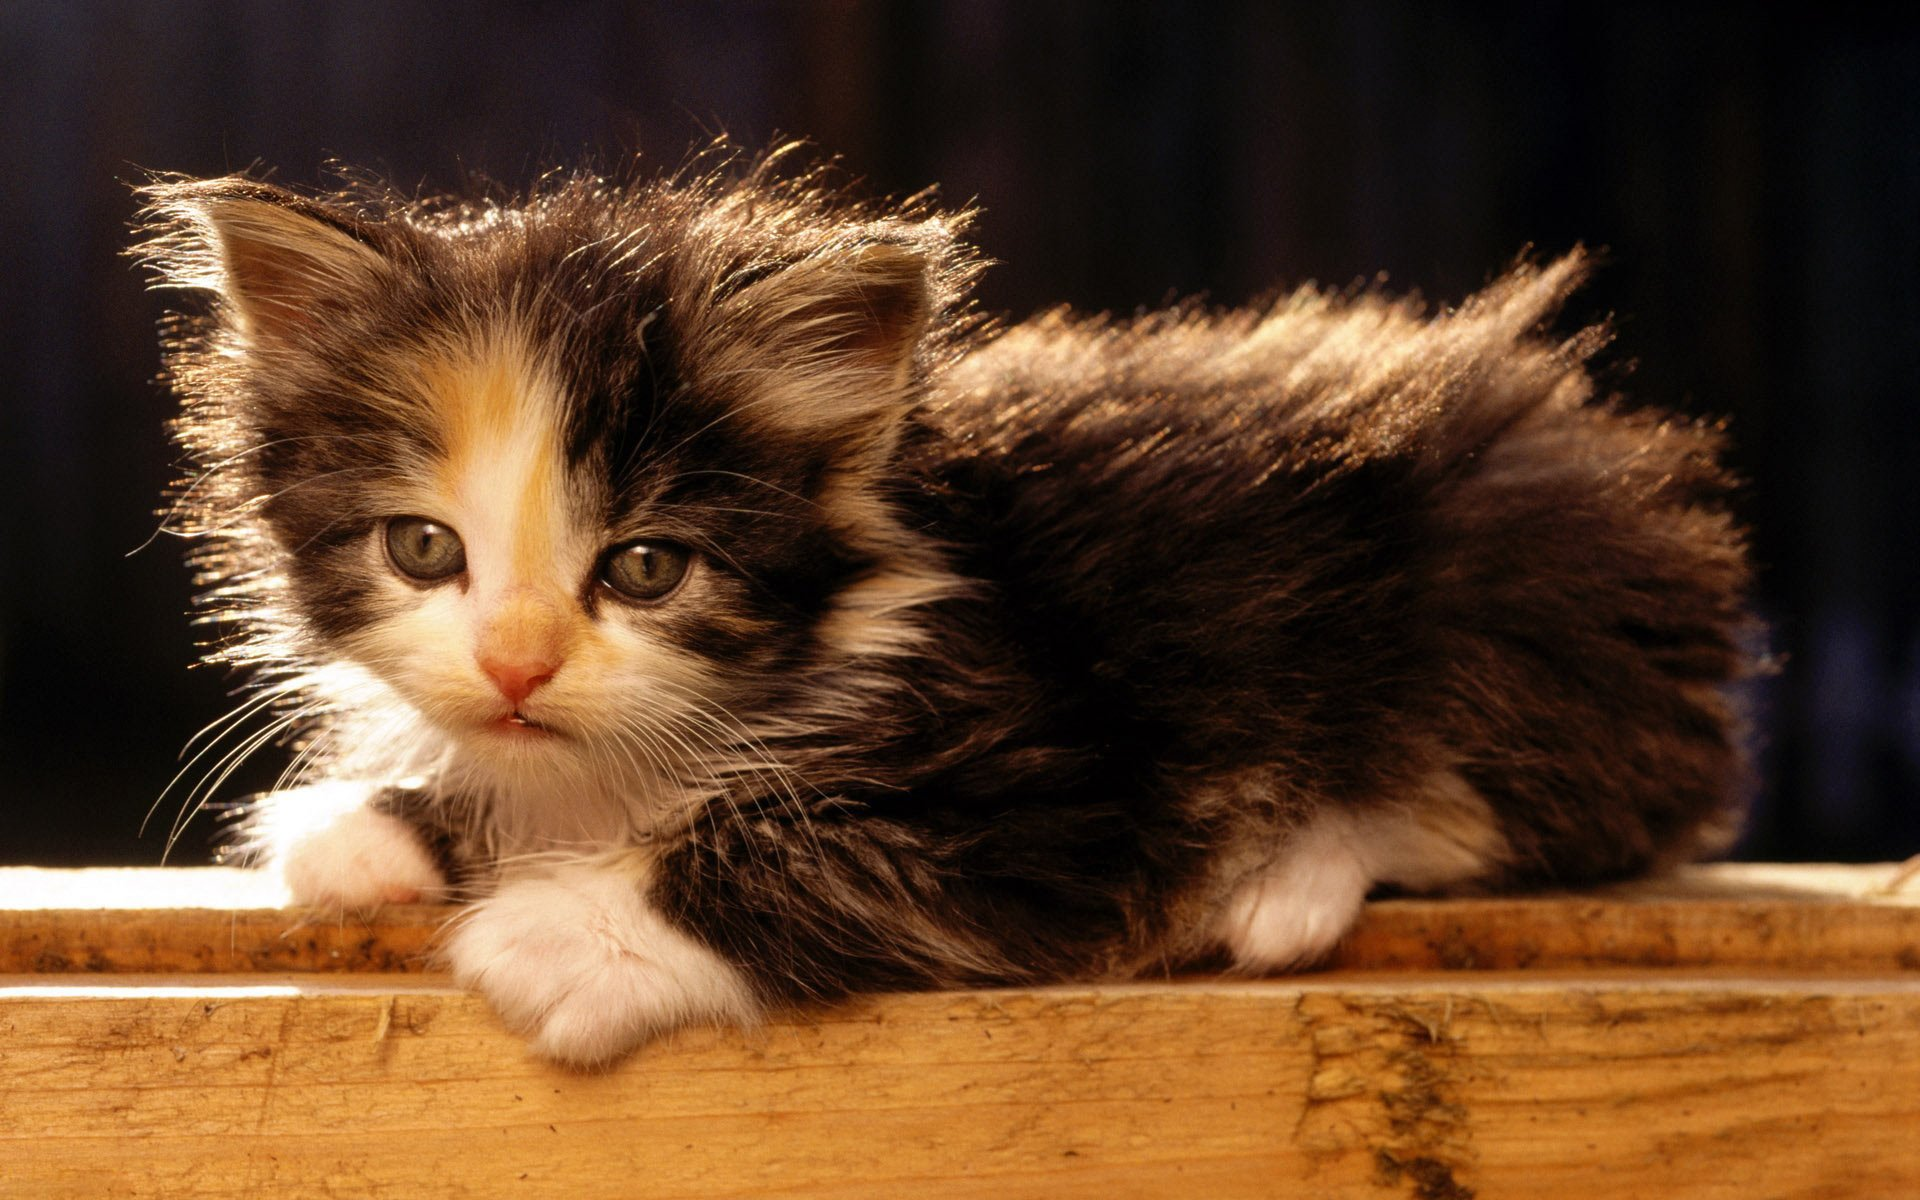 An Adorable American Bobtail Kitten